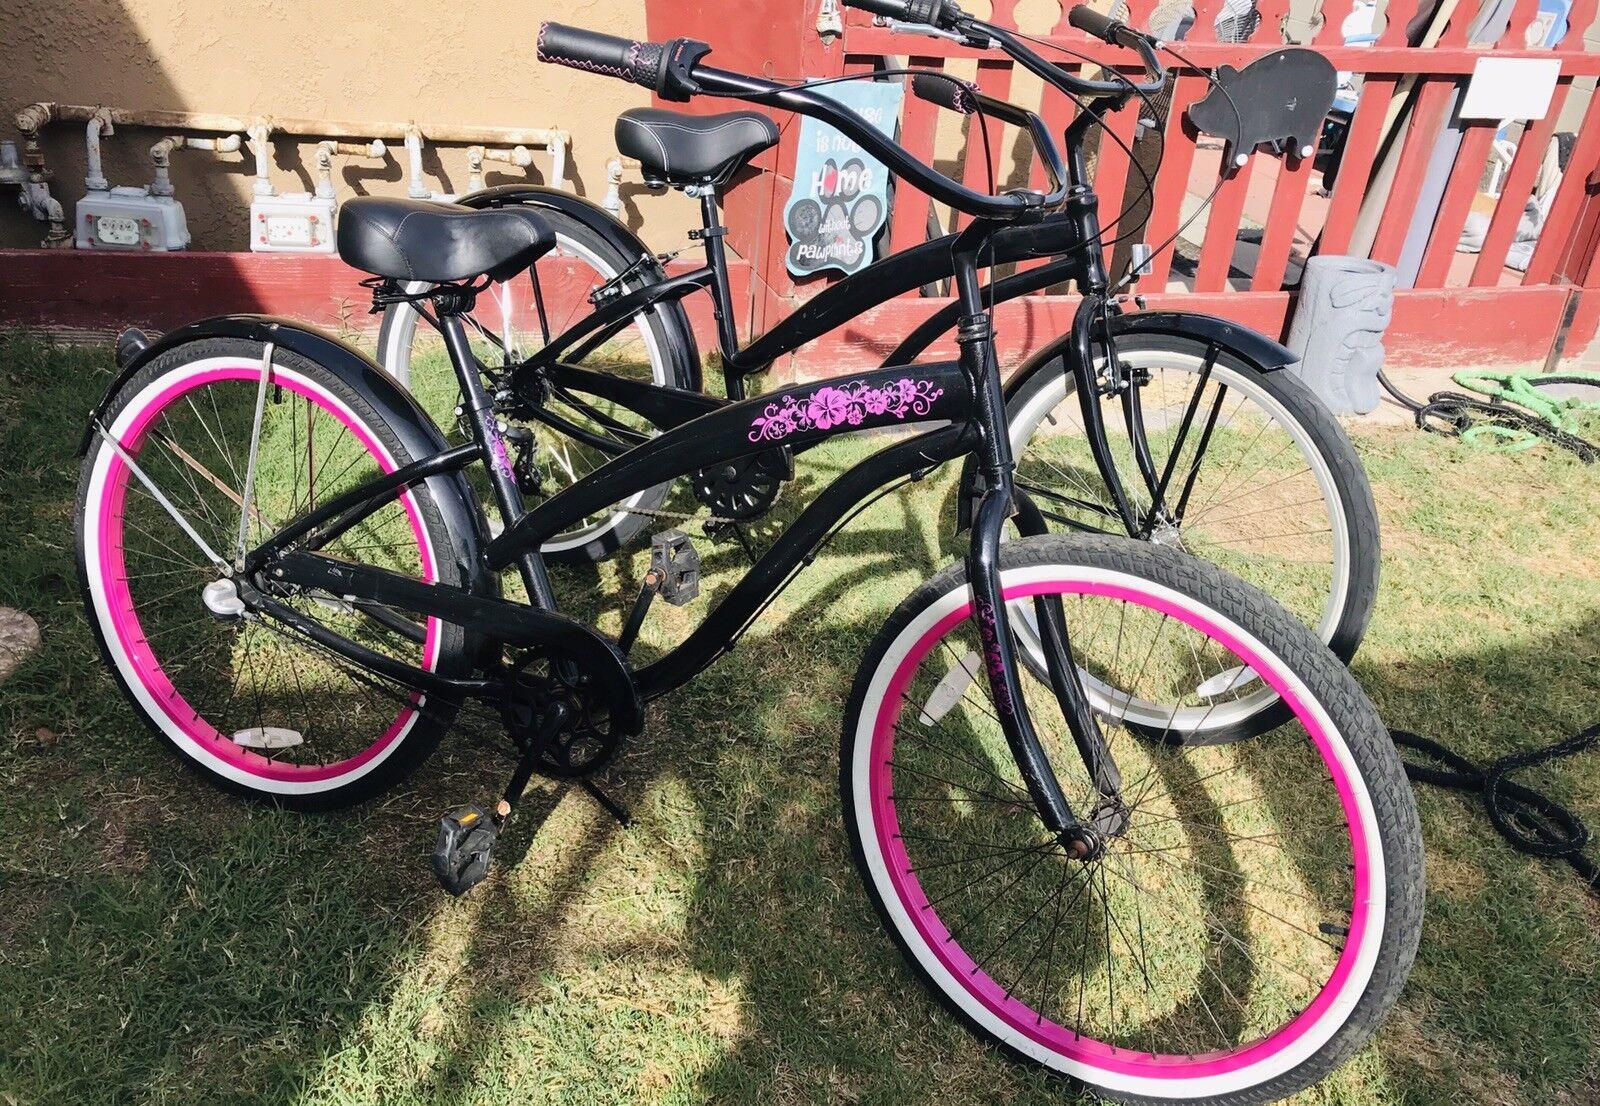 3 Speed And 7 Speed Greenline Bikes